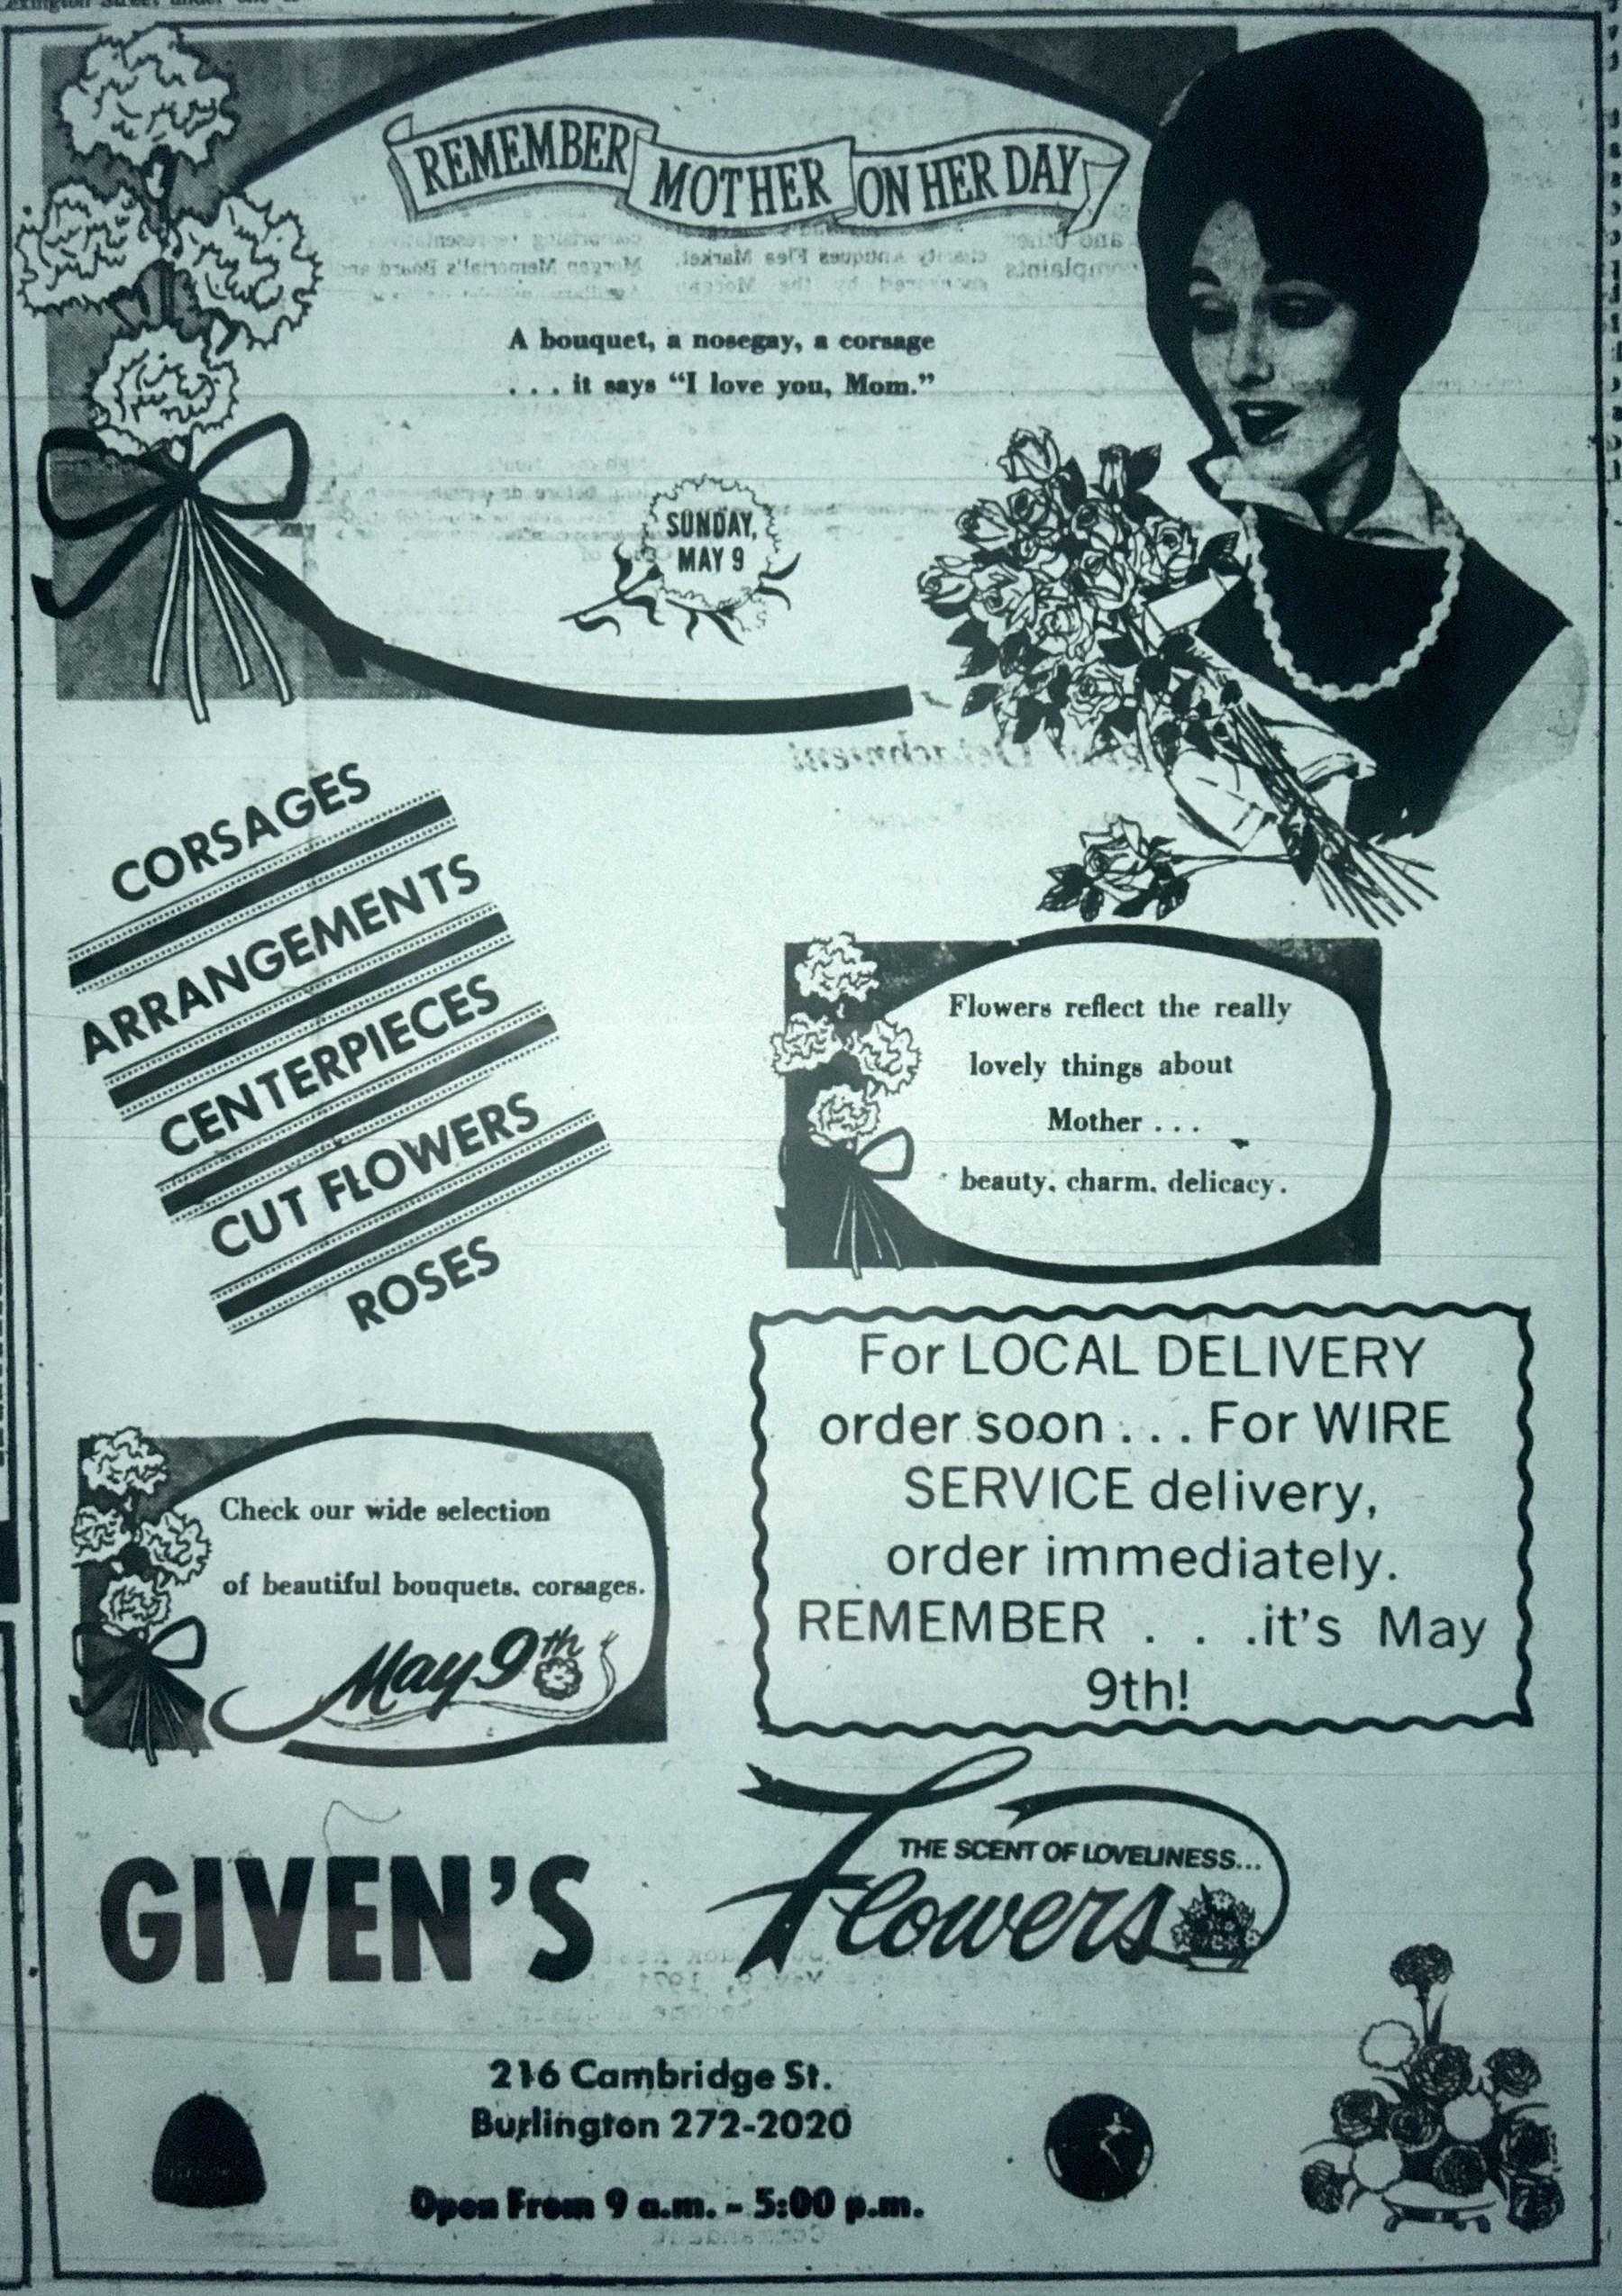 Given's florist, Burlington MA